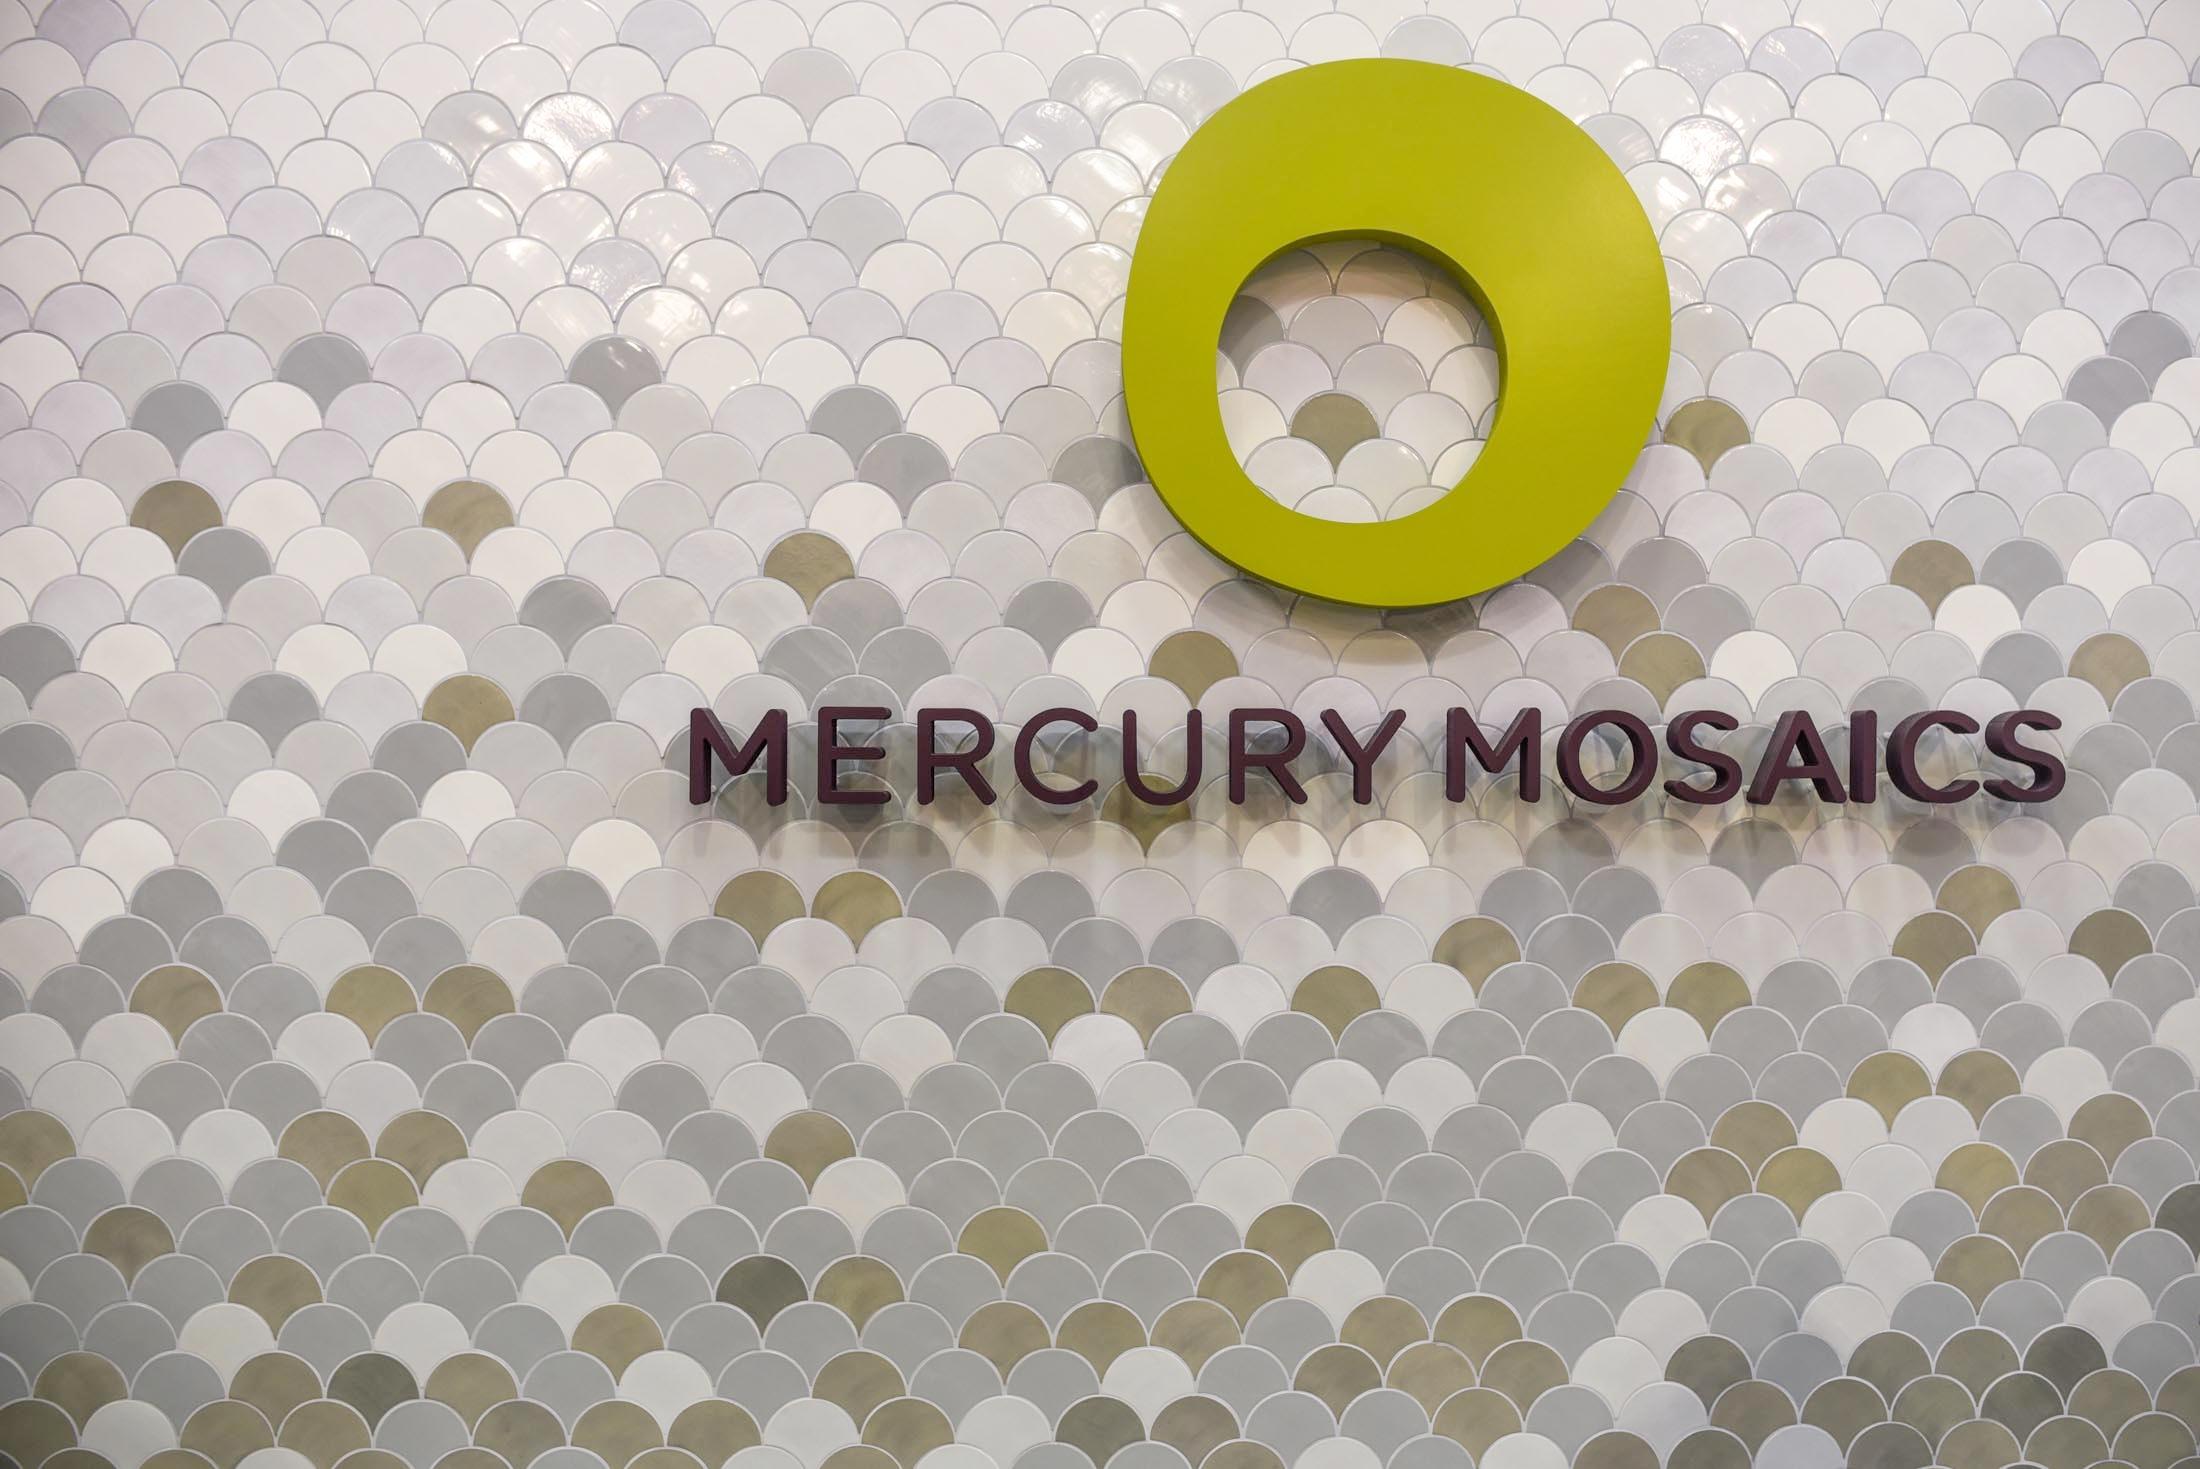 MercuryMosaics-24.jpg